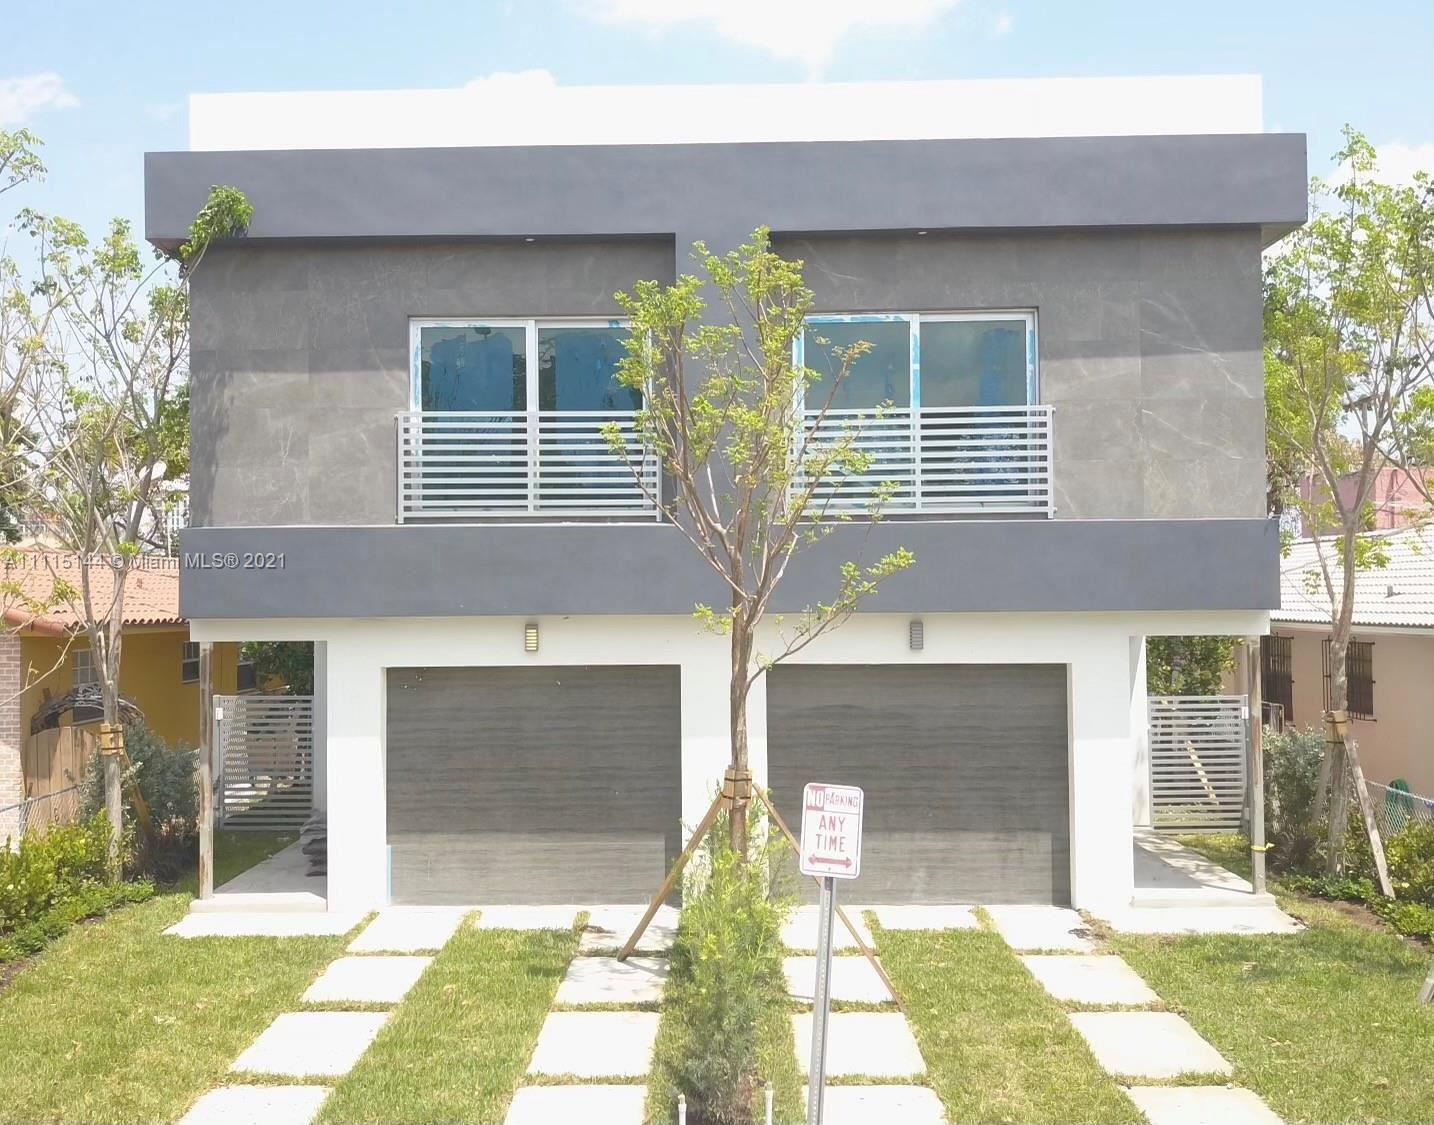 3461 SW 25th St #B, Miami, FL 33133 - #: A11115144